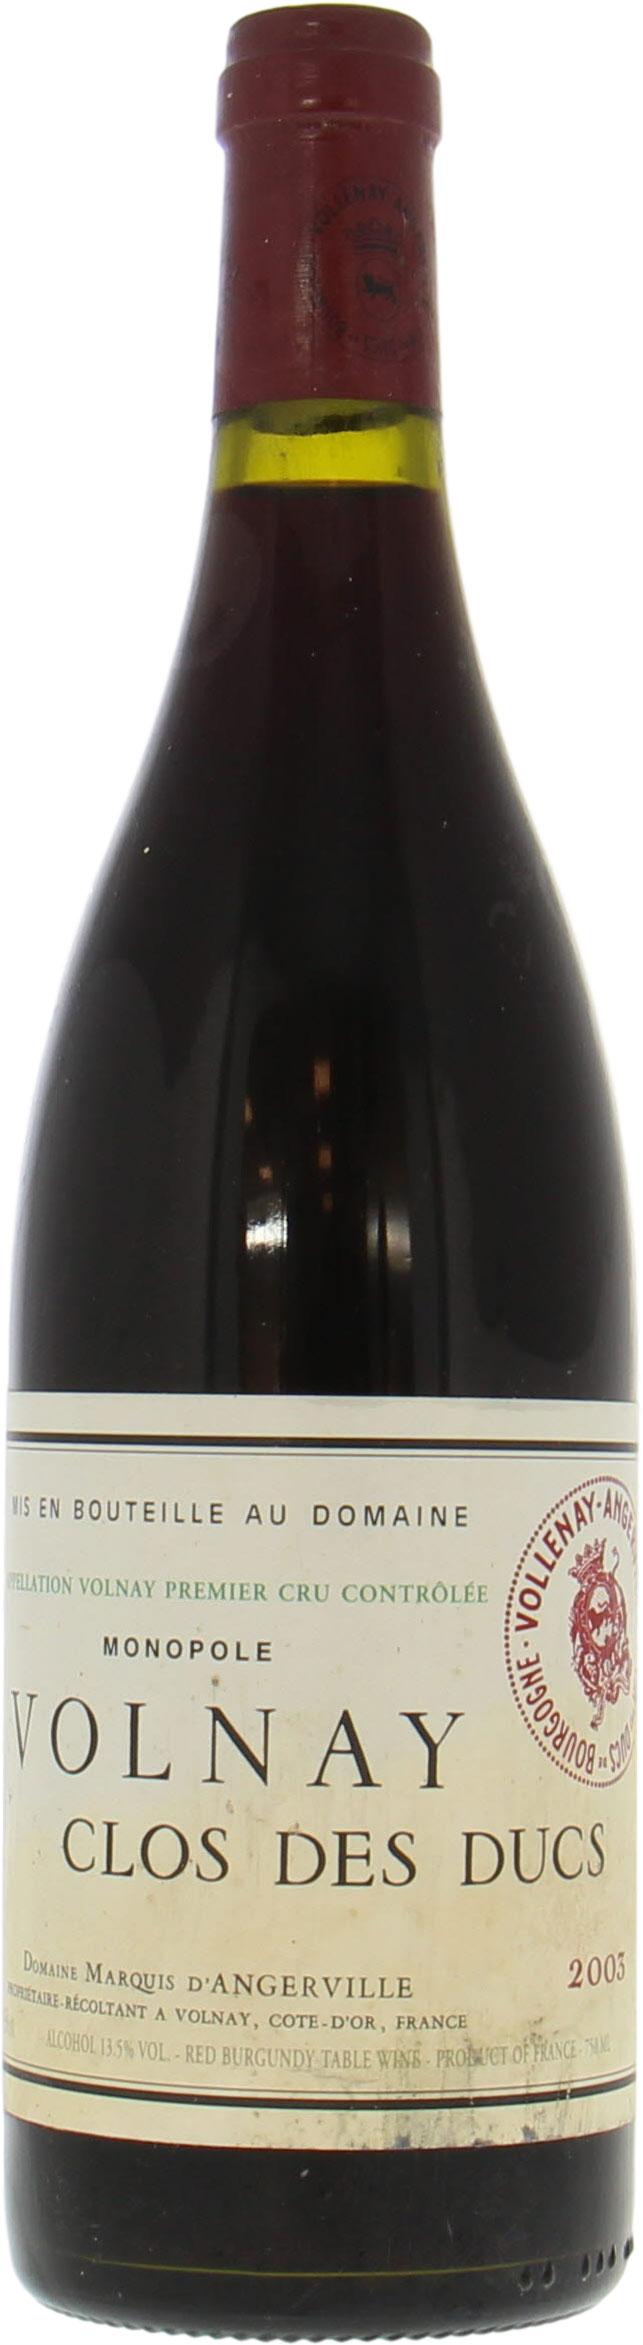 Volnay Clos Des Ducs 2003 Marquis D Angerville Buy Online Best Of Wines